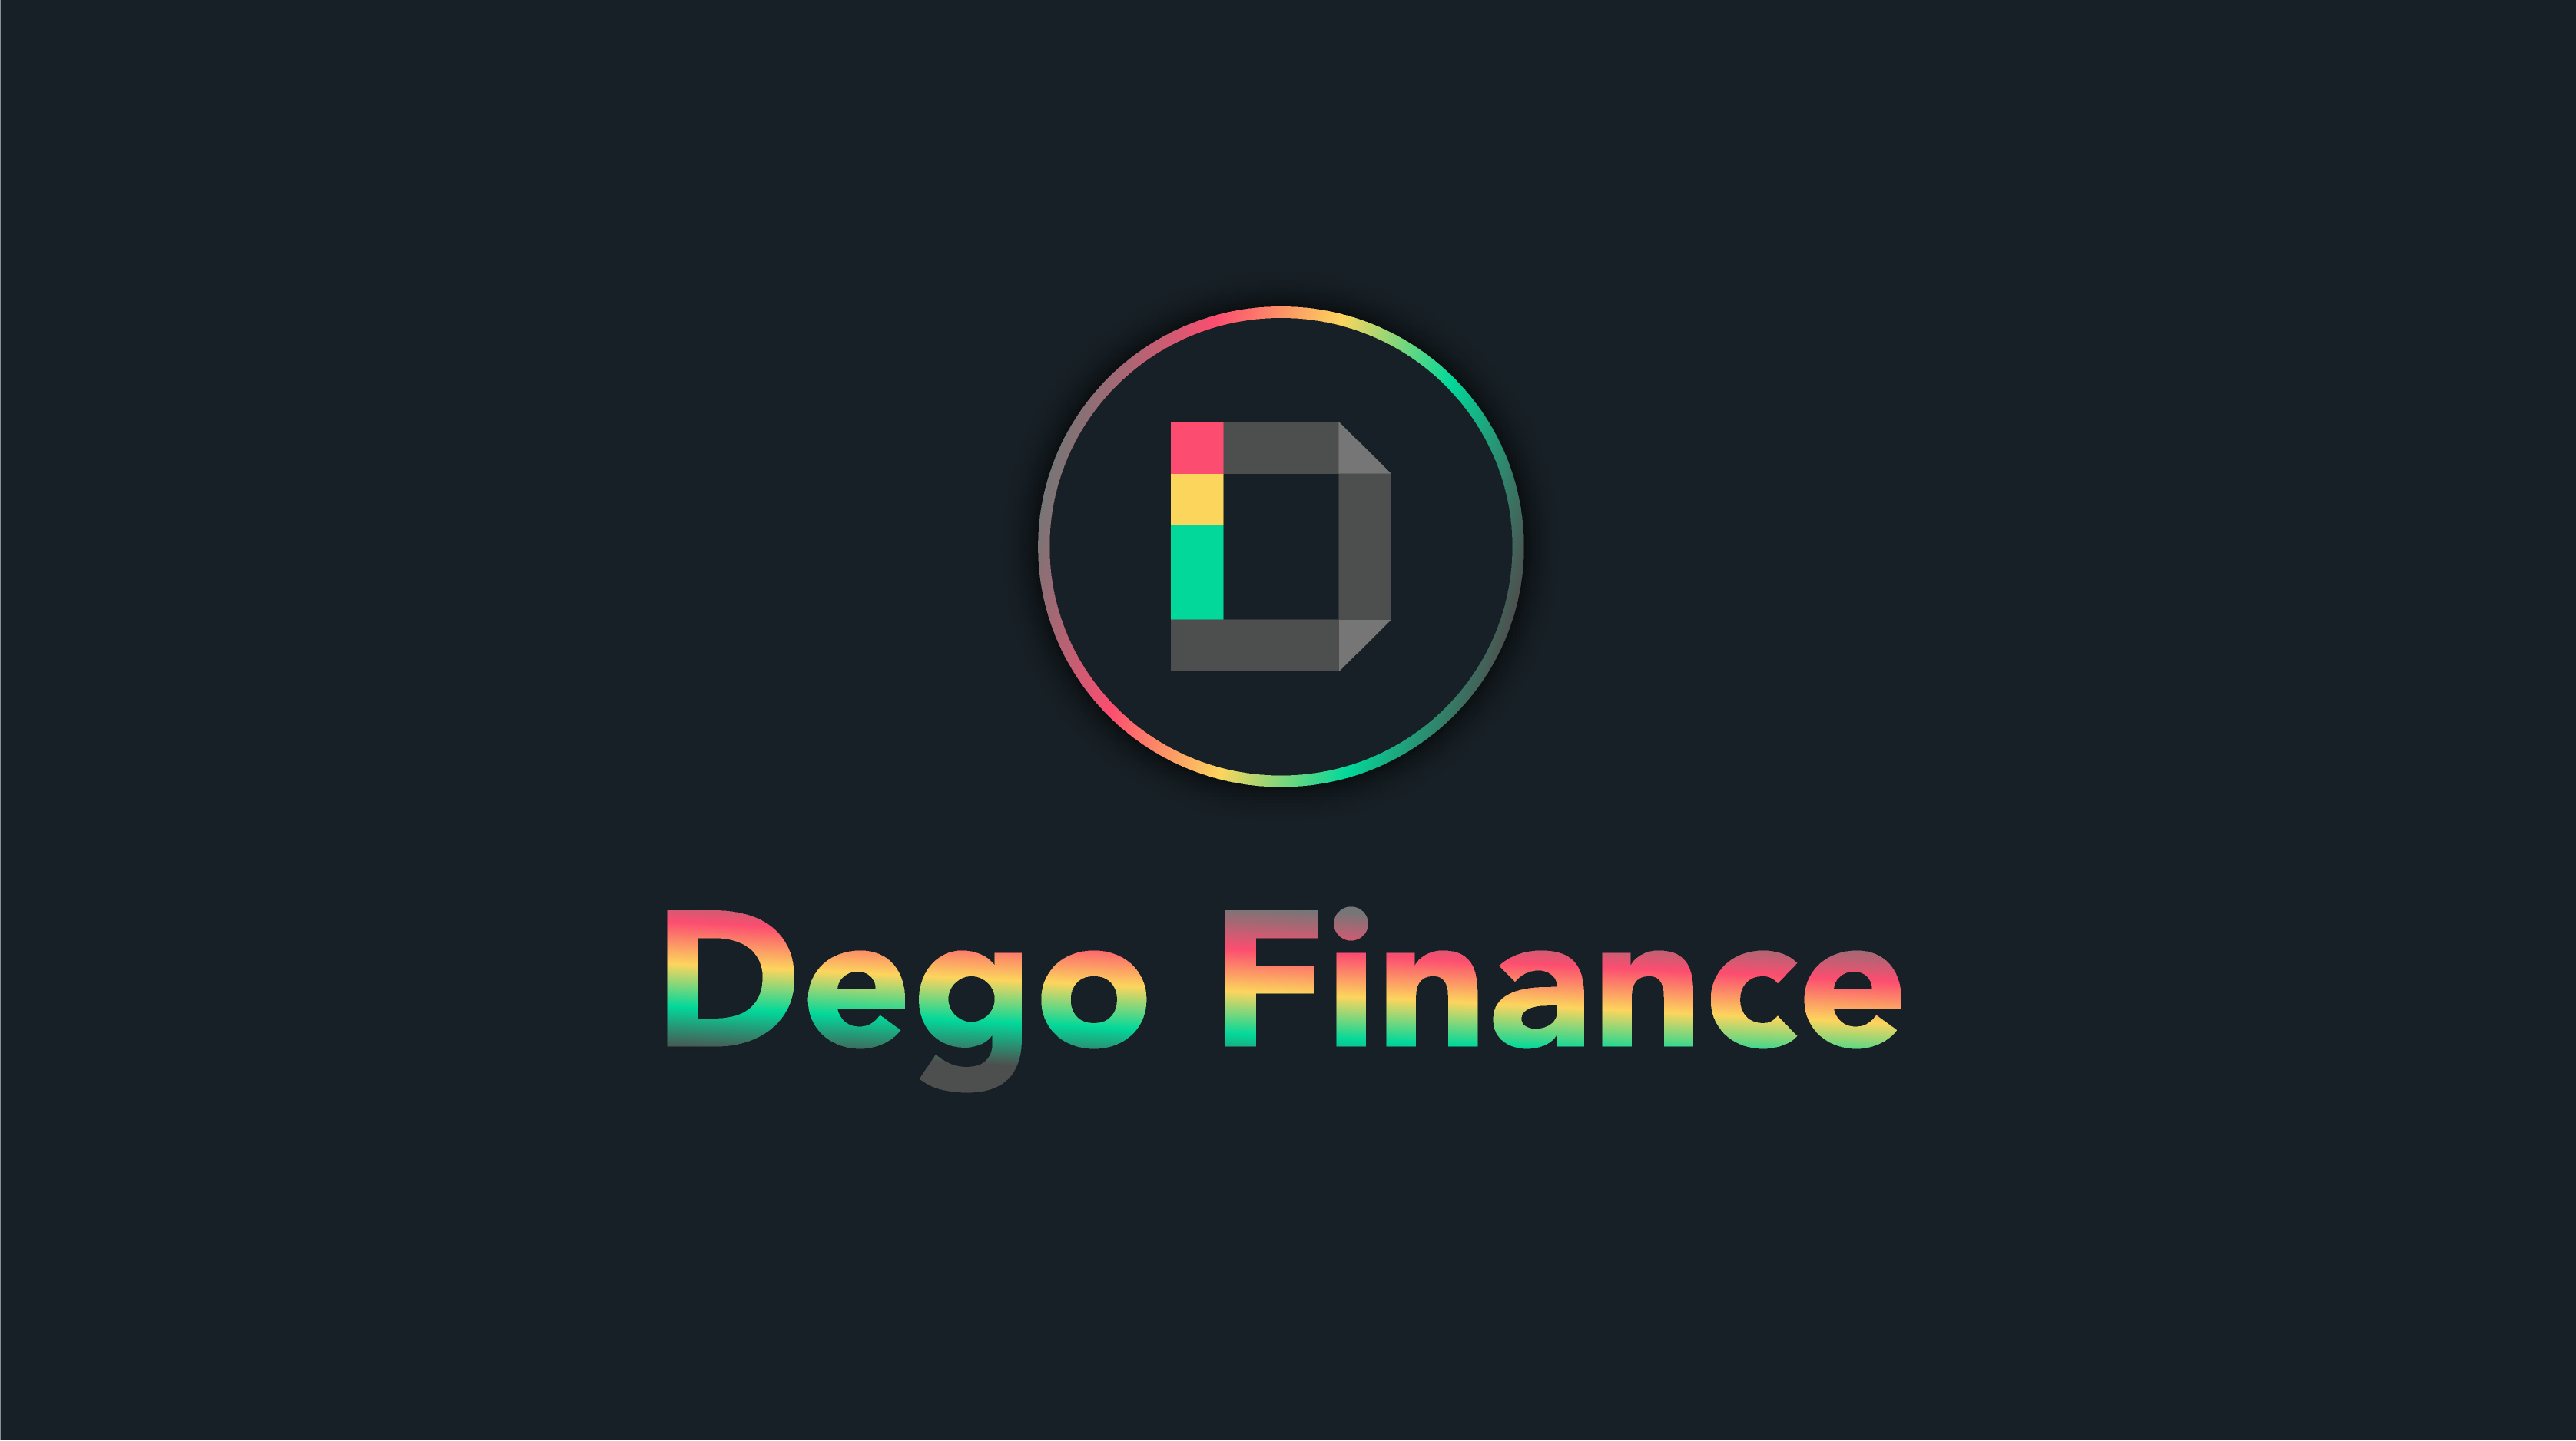 Dego-finance-